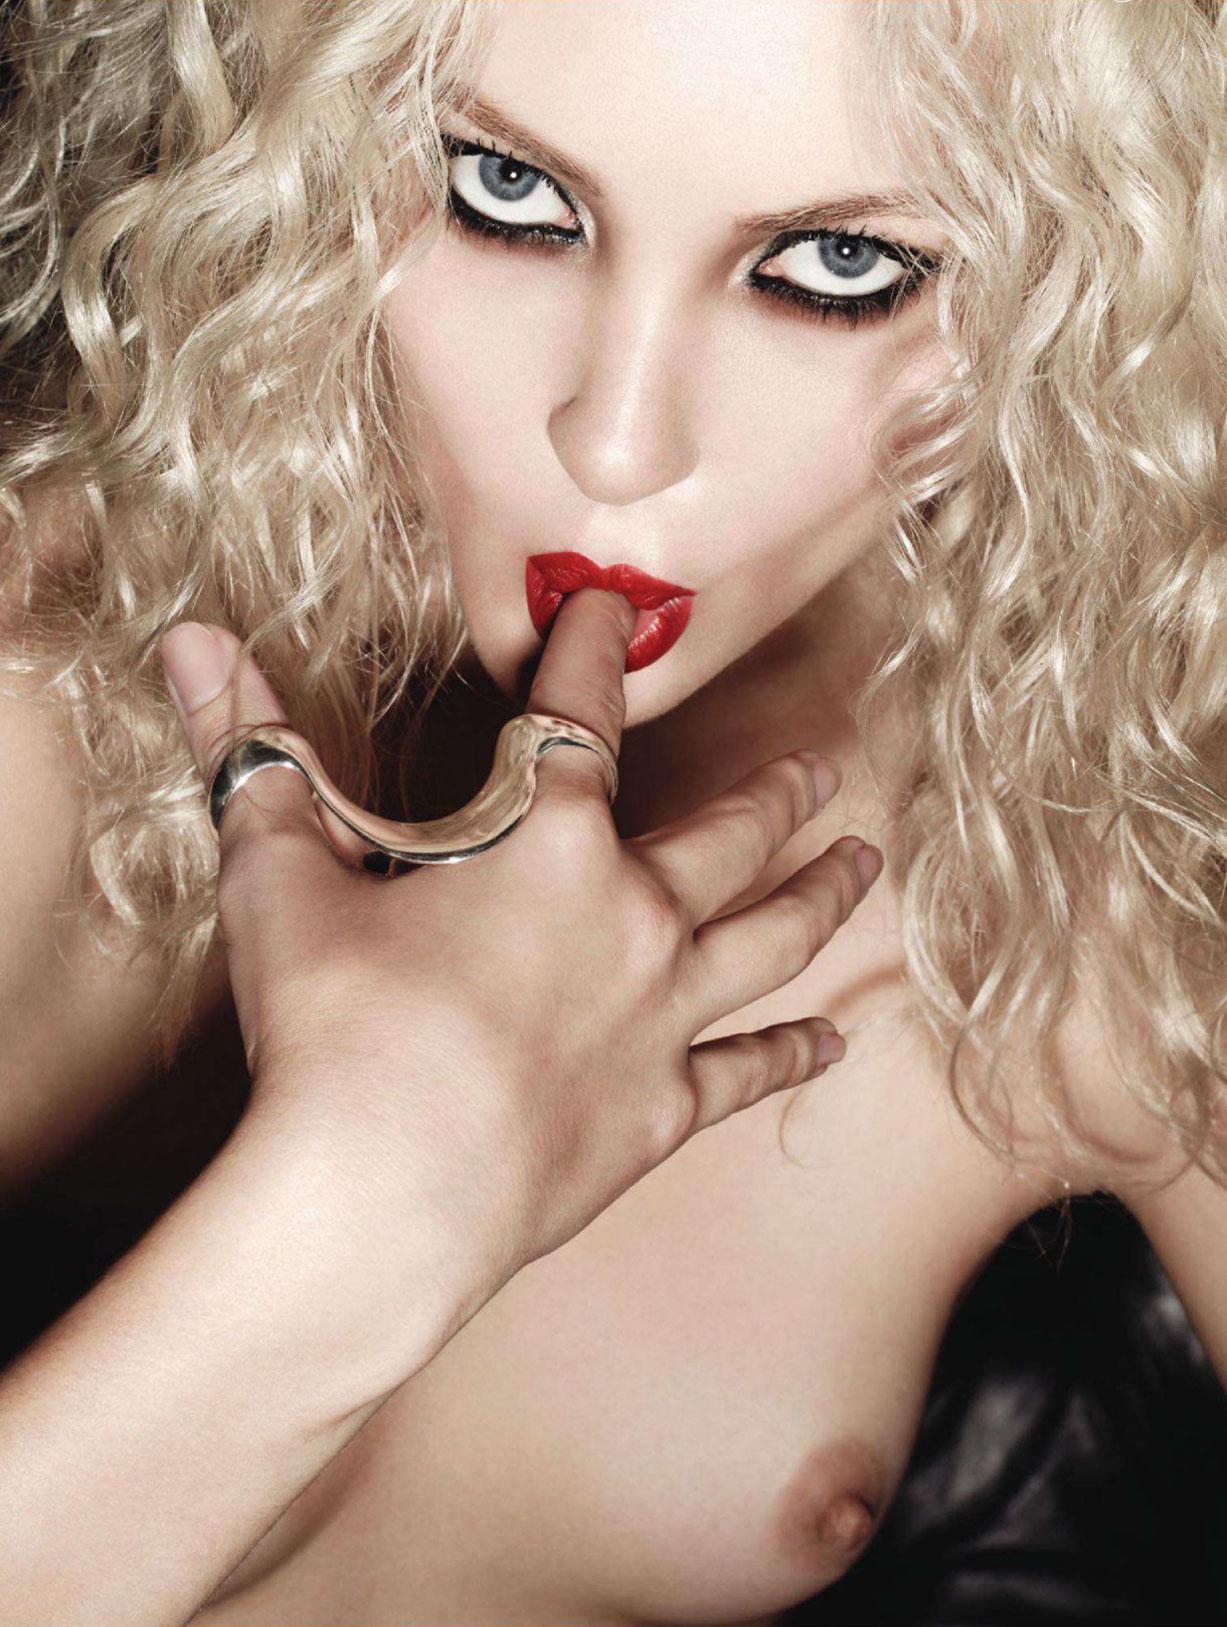 Brooke Bonelli nude by Steve Shaw / Treats! Magazine, issue 1, spring 2011